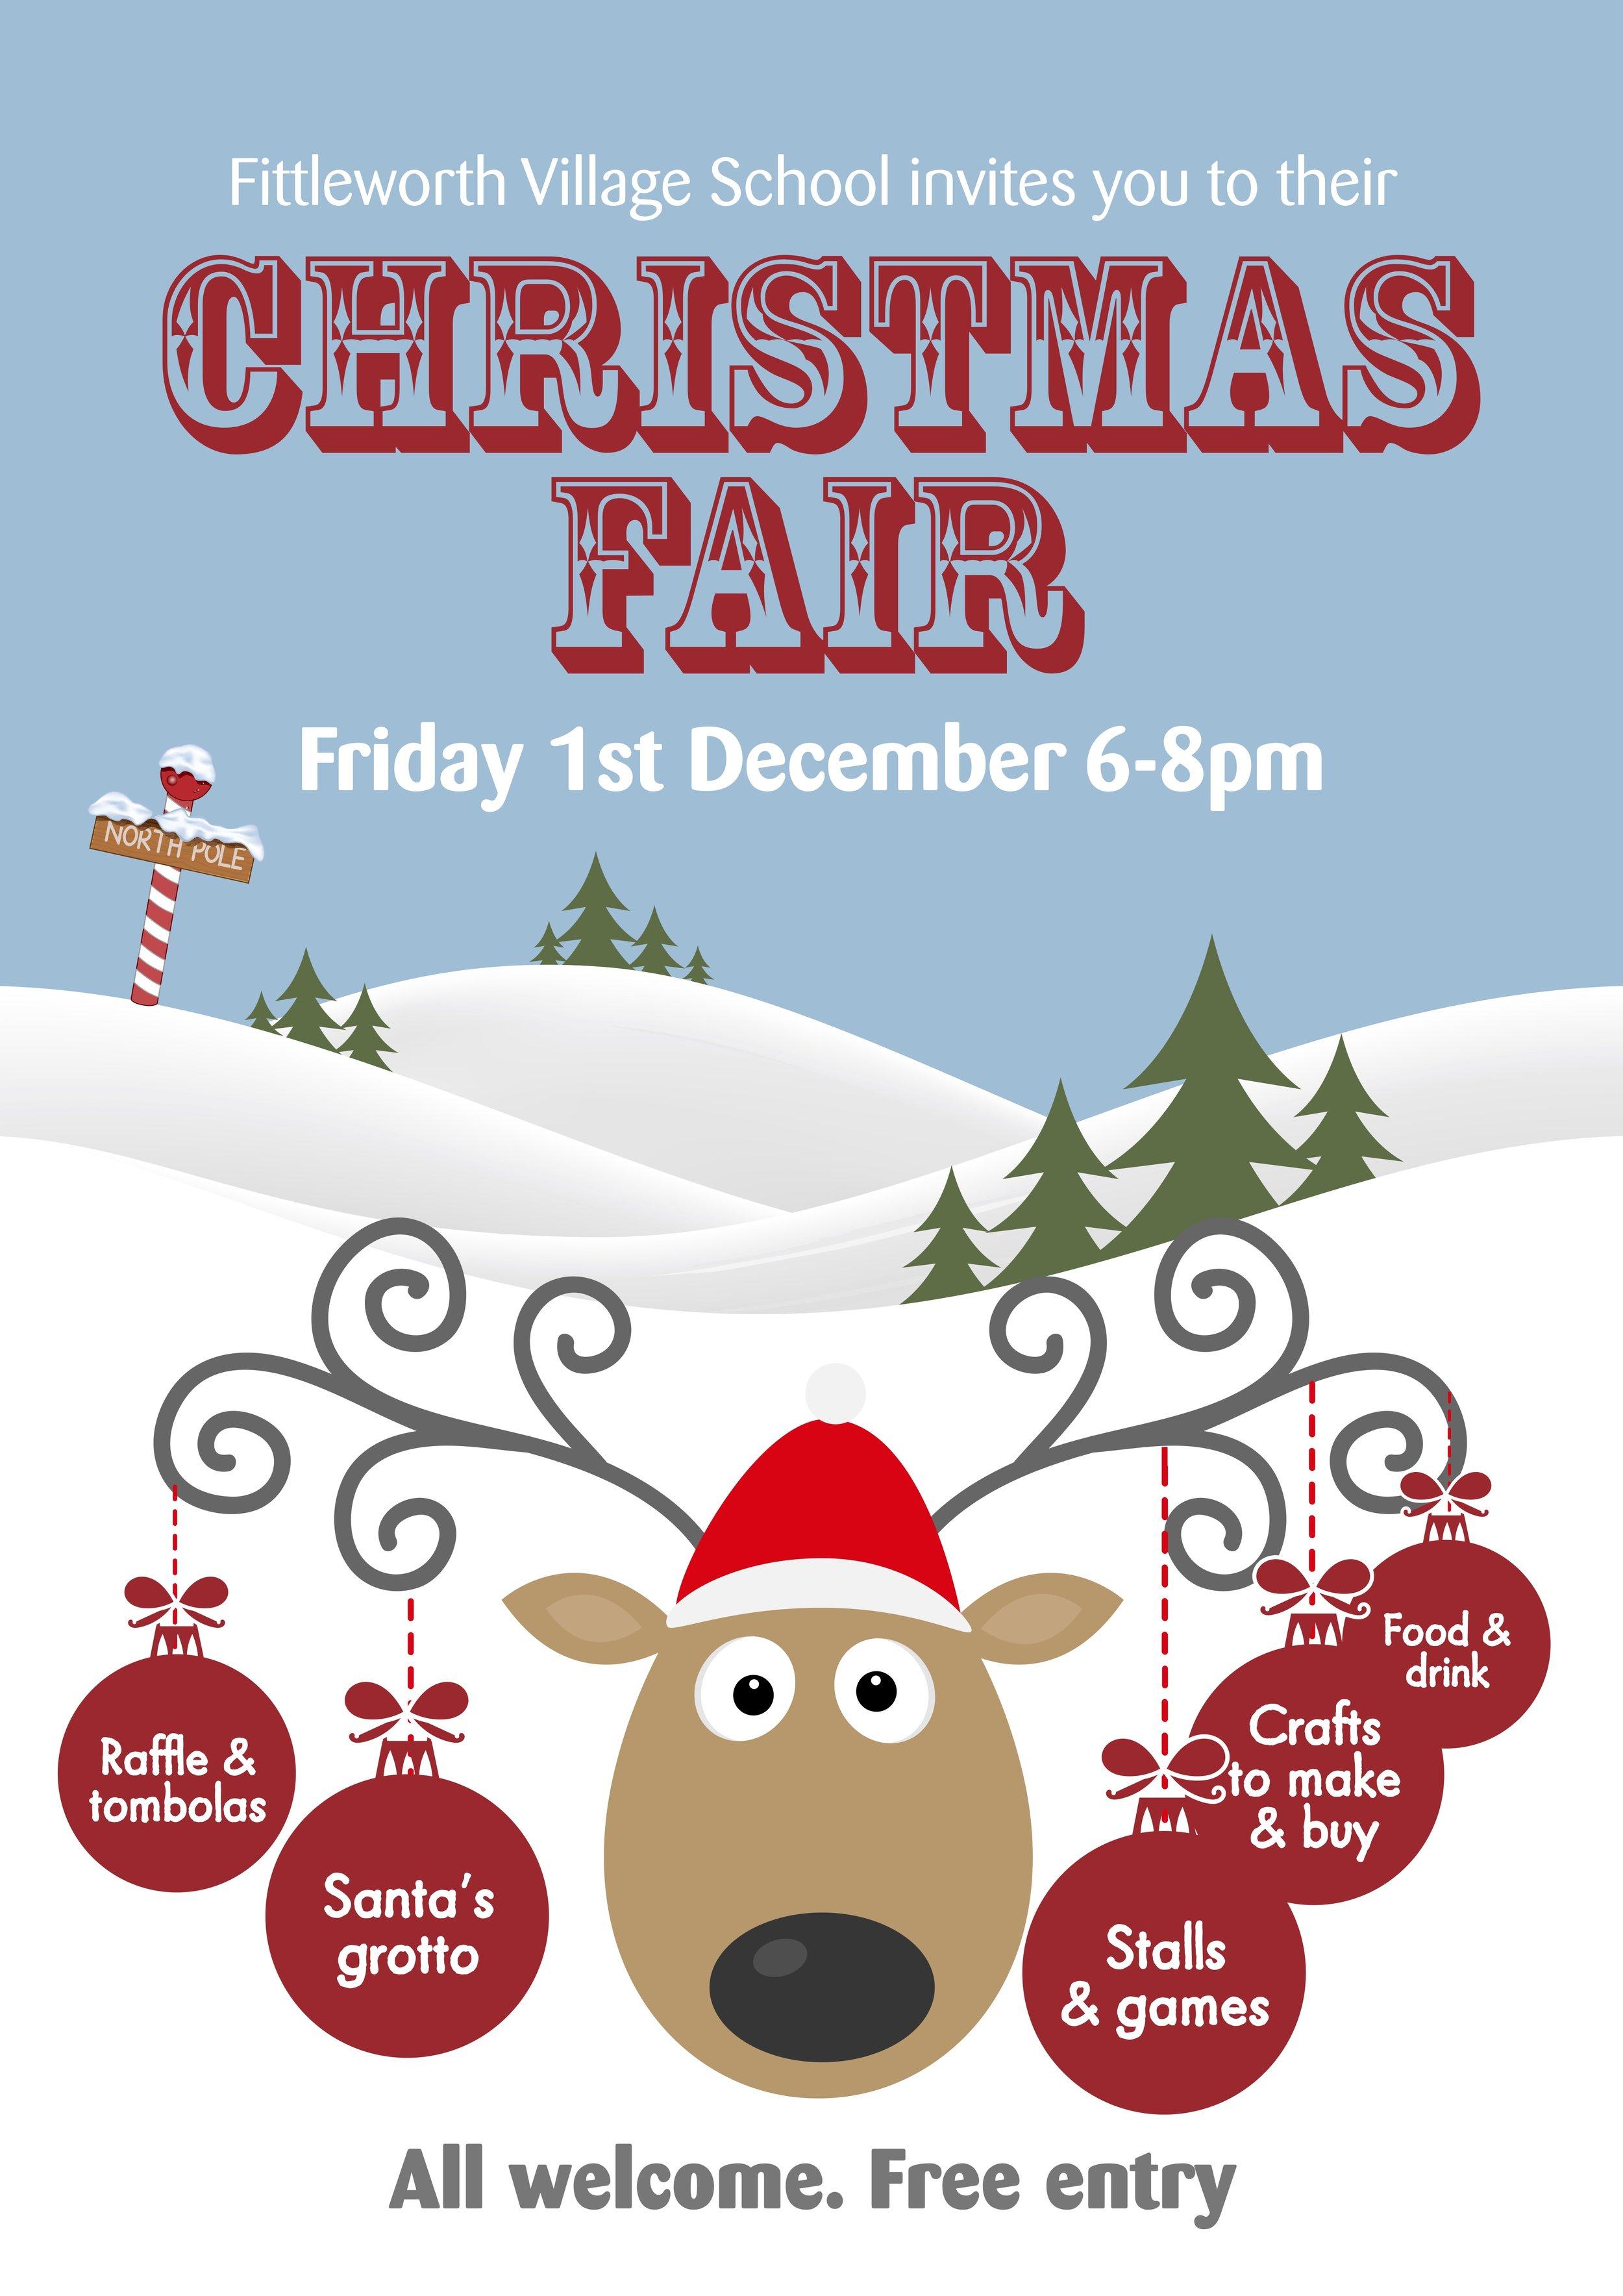 Fittleworth C of E Village School Christmas Fair